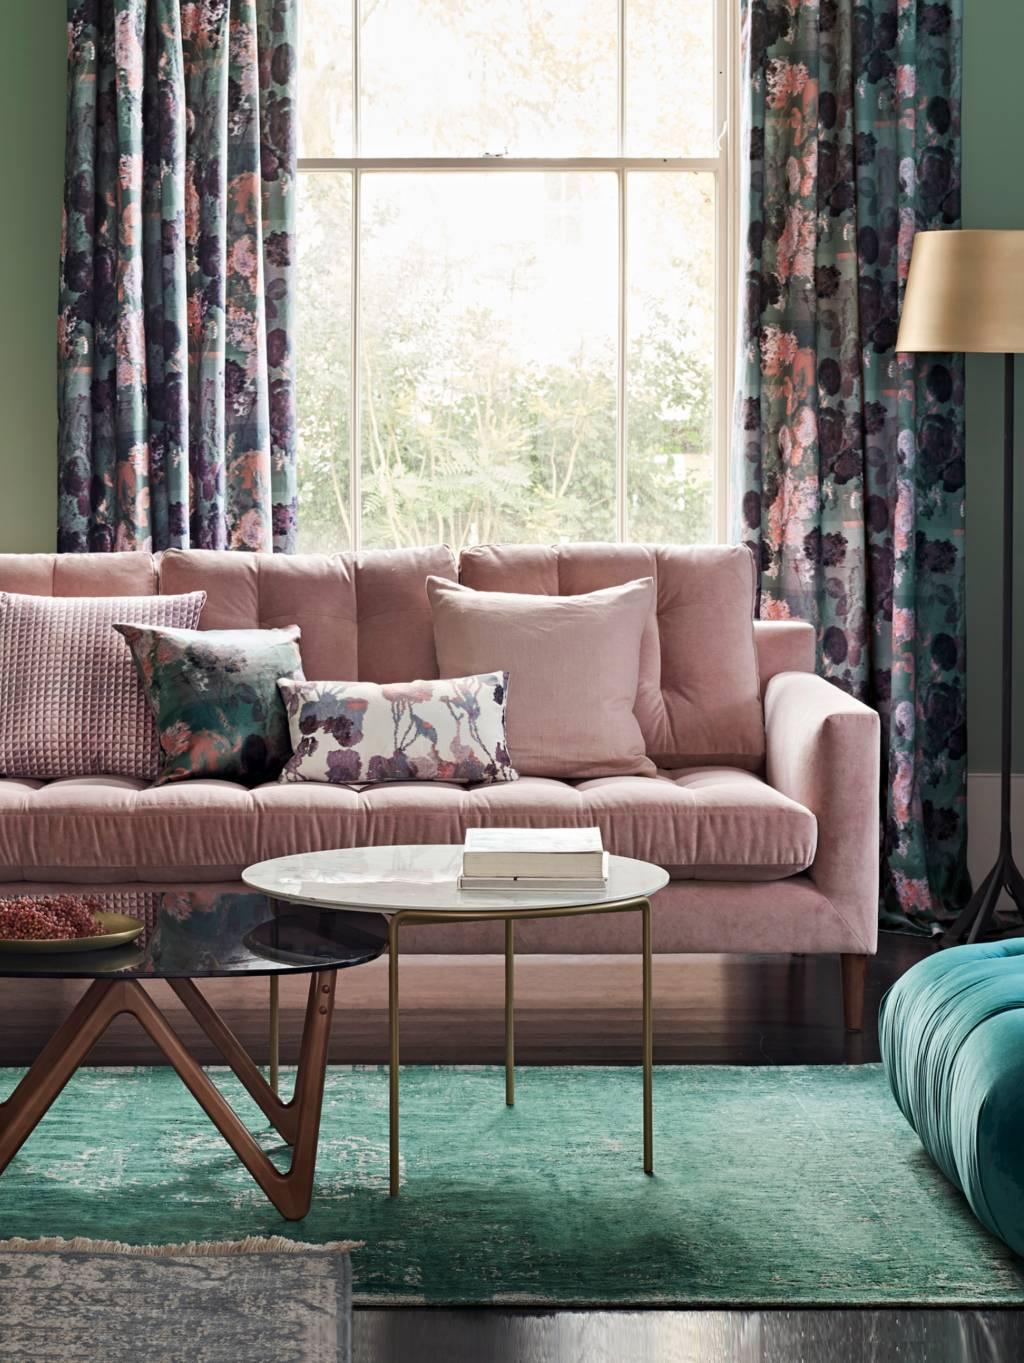 Green living room with pink sofa | Green living room ideas | www.kittyandb.com